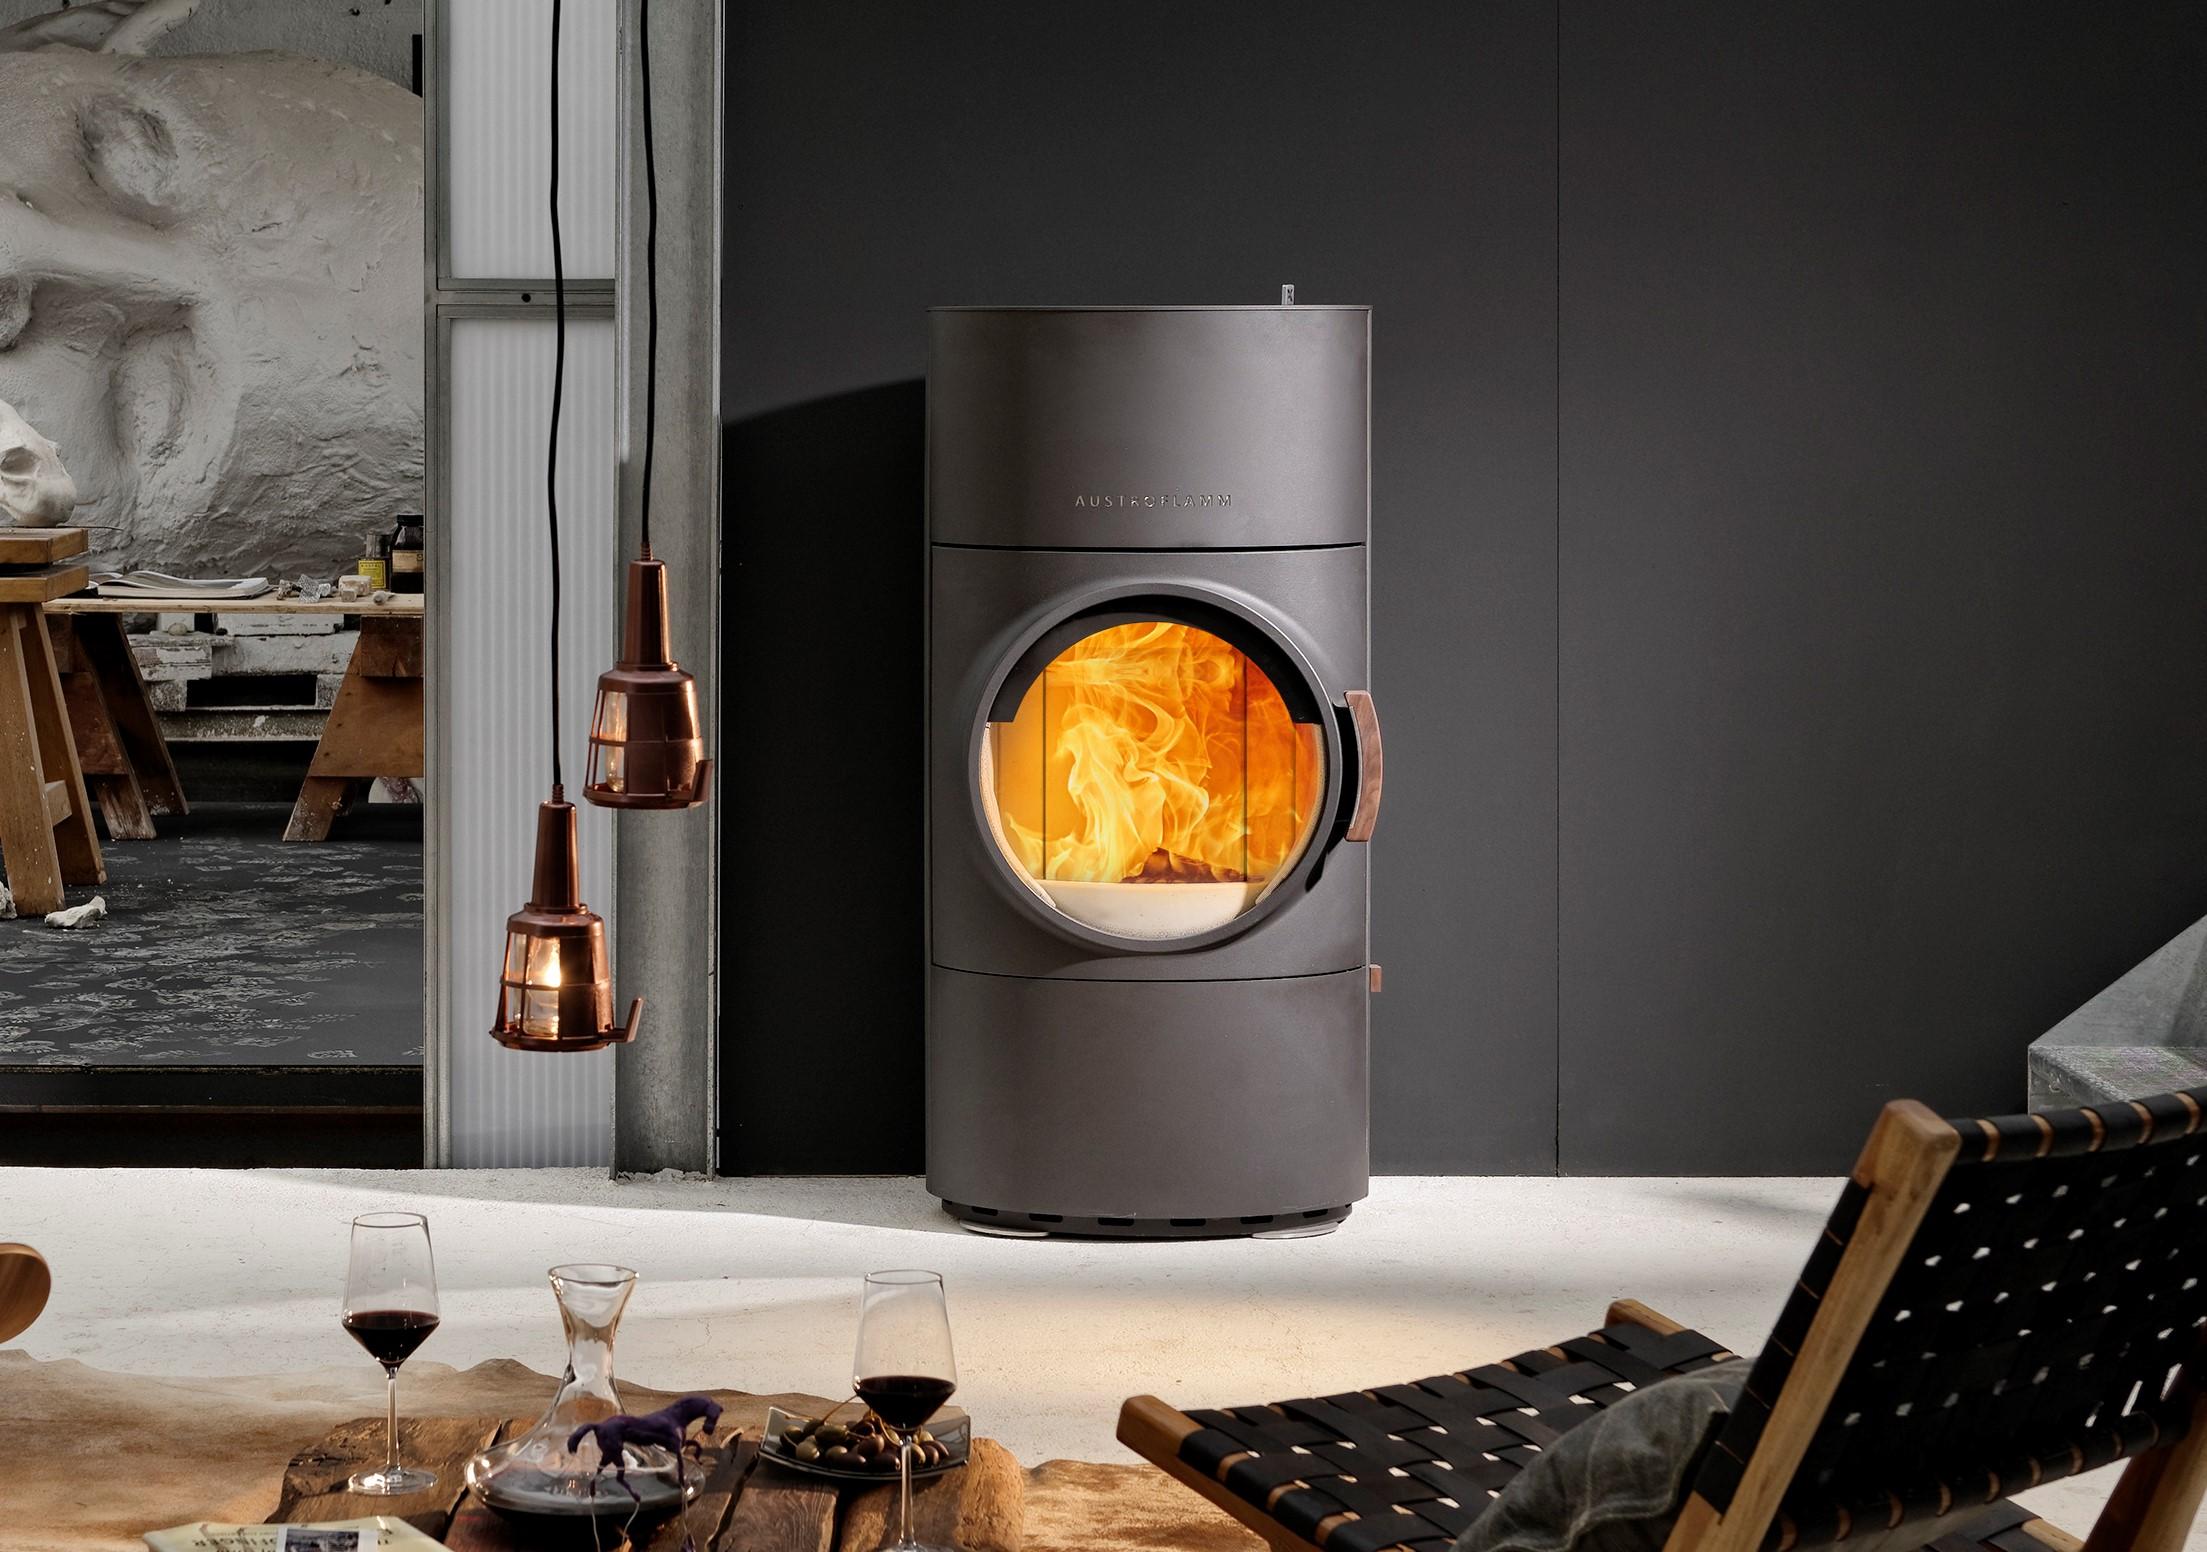 austroflamm kamin fen flammenspiel. Black Bedroom Furniture Sets. Home Design Ideas